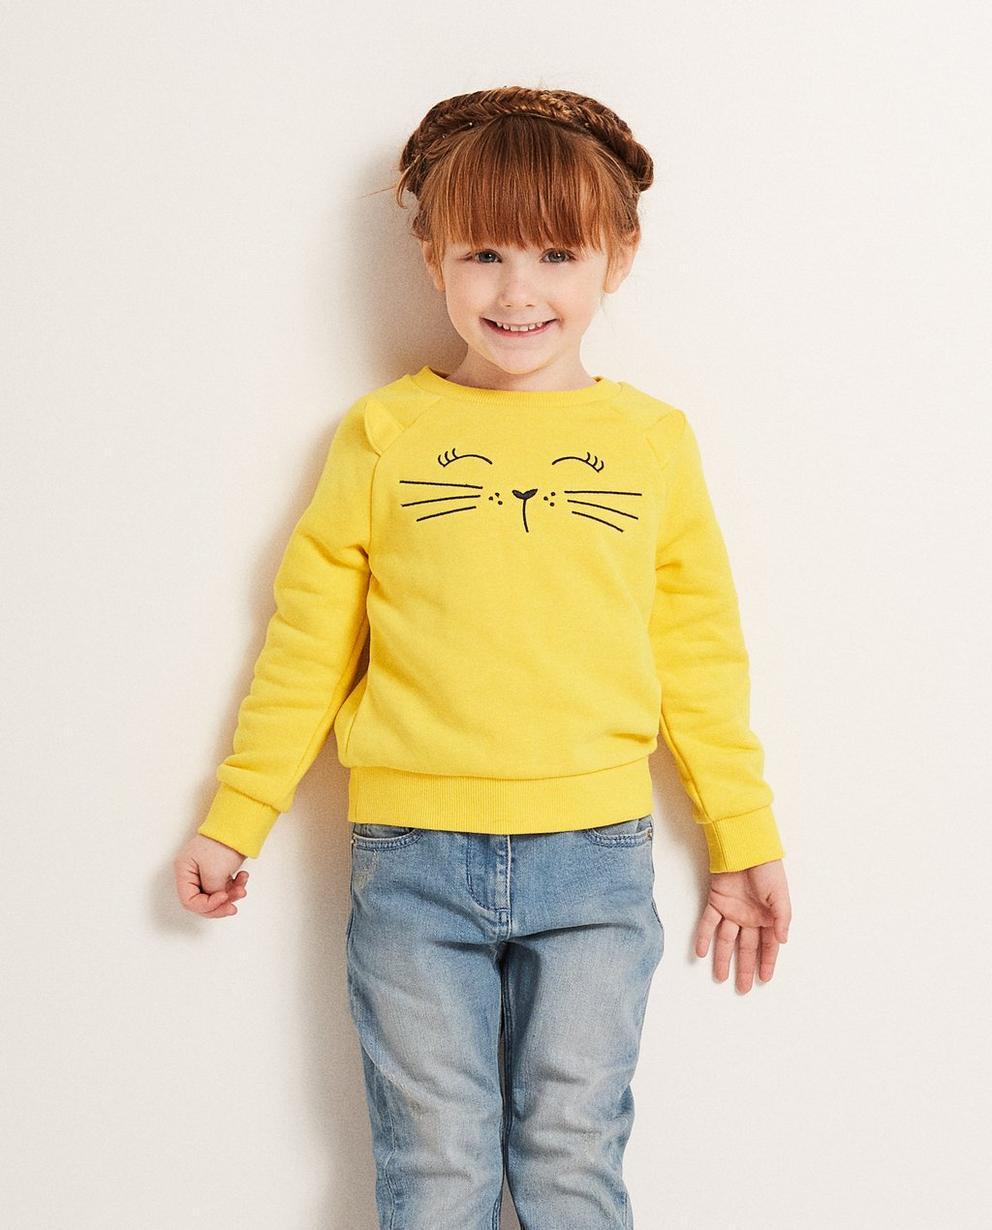 Sweater - Honig - Sweatshirt mit Katzenprint